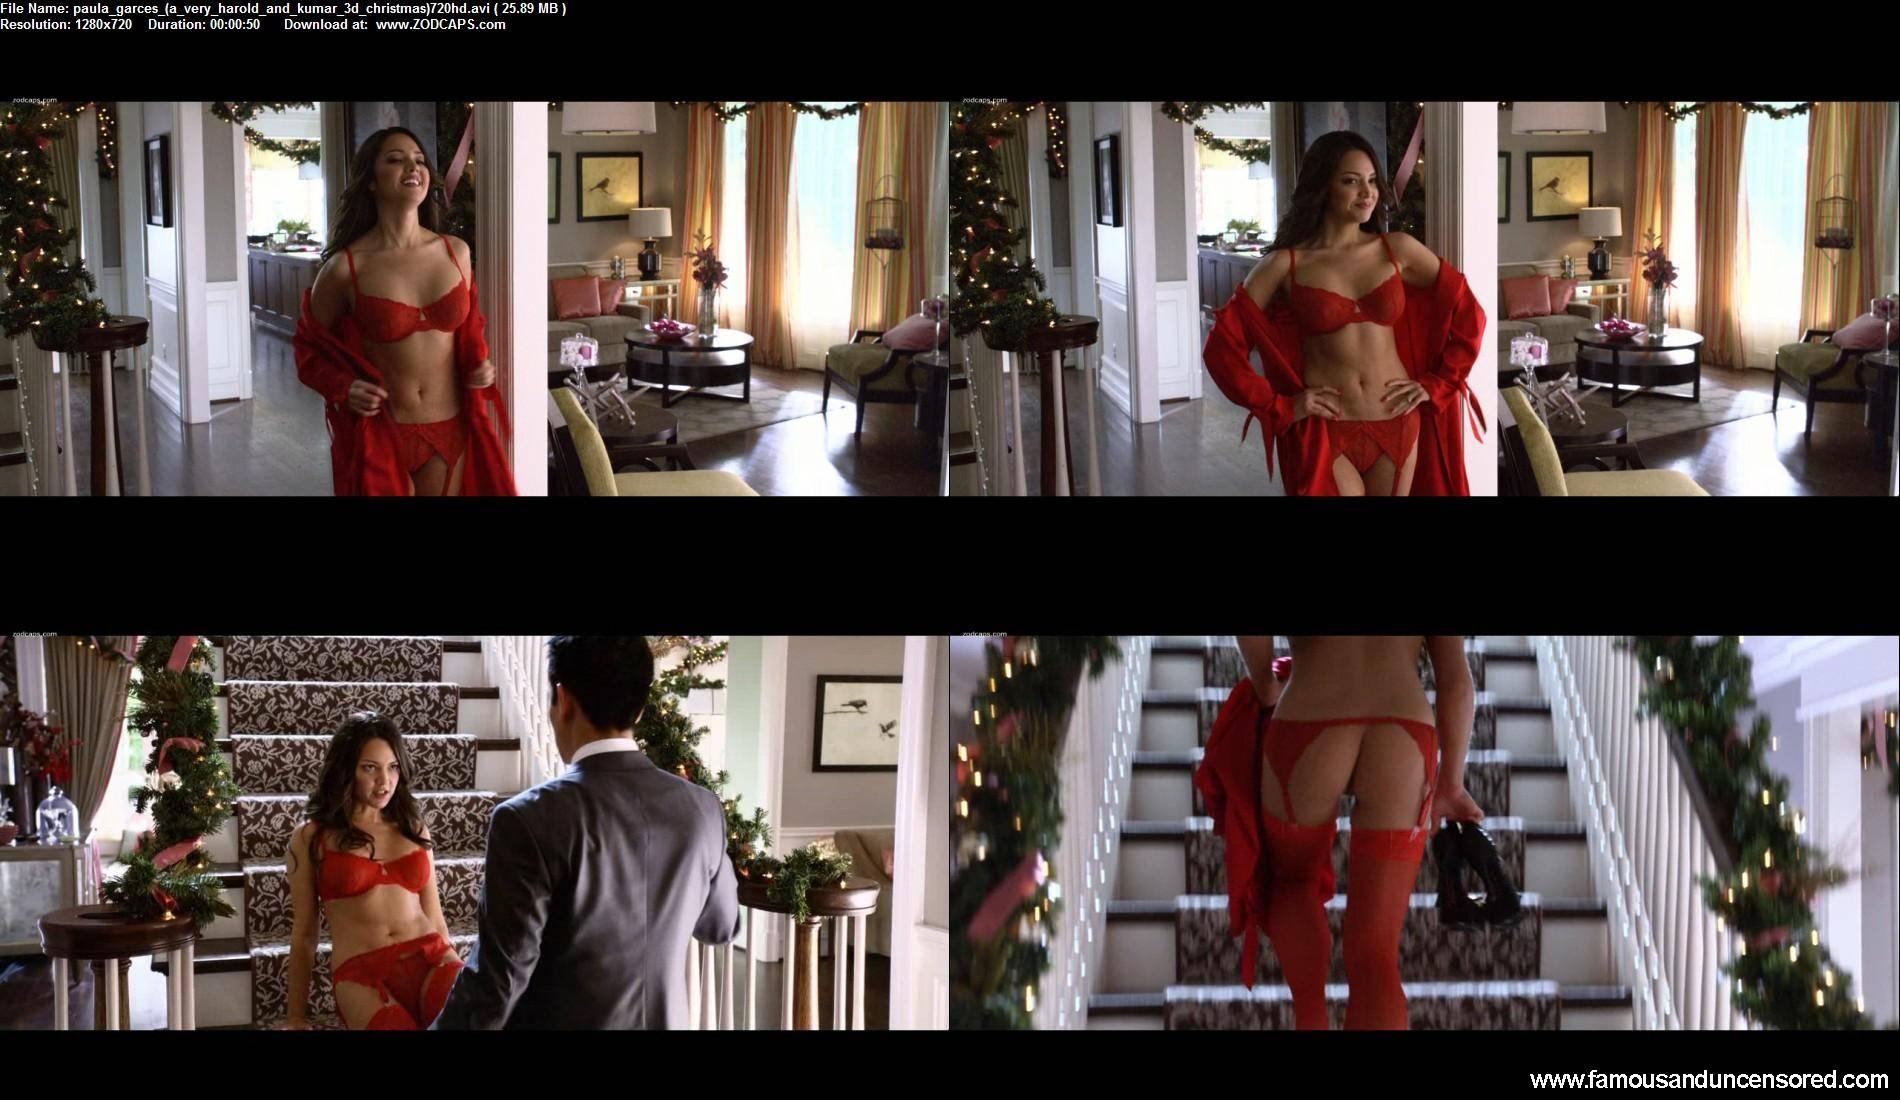 image Paula garces a very harold and kumar 3d christmas